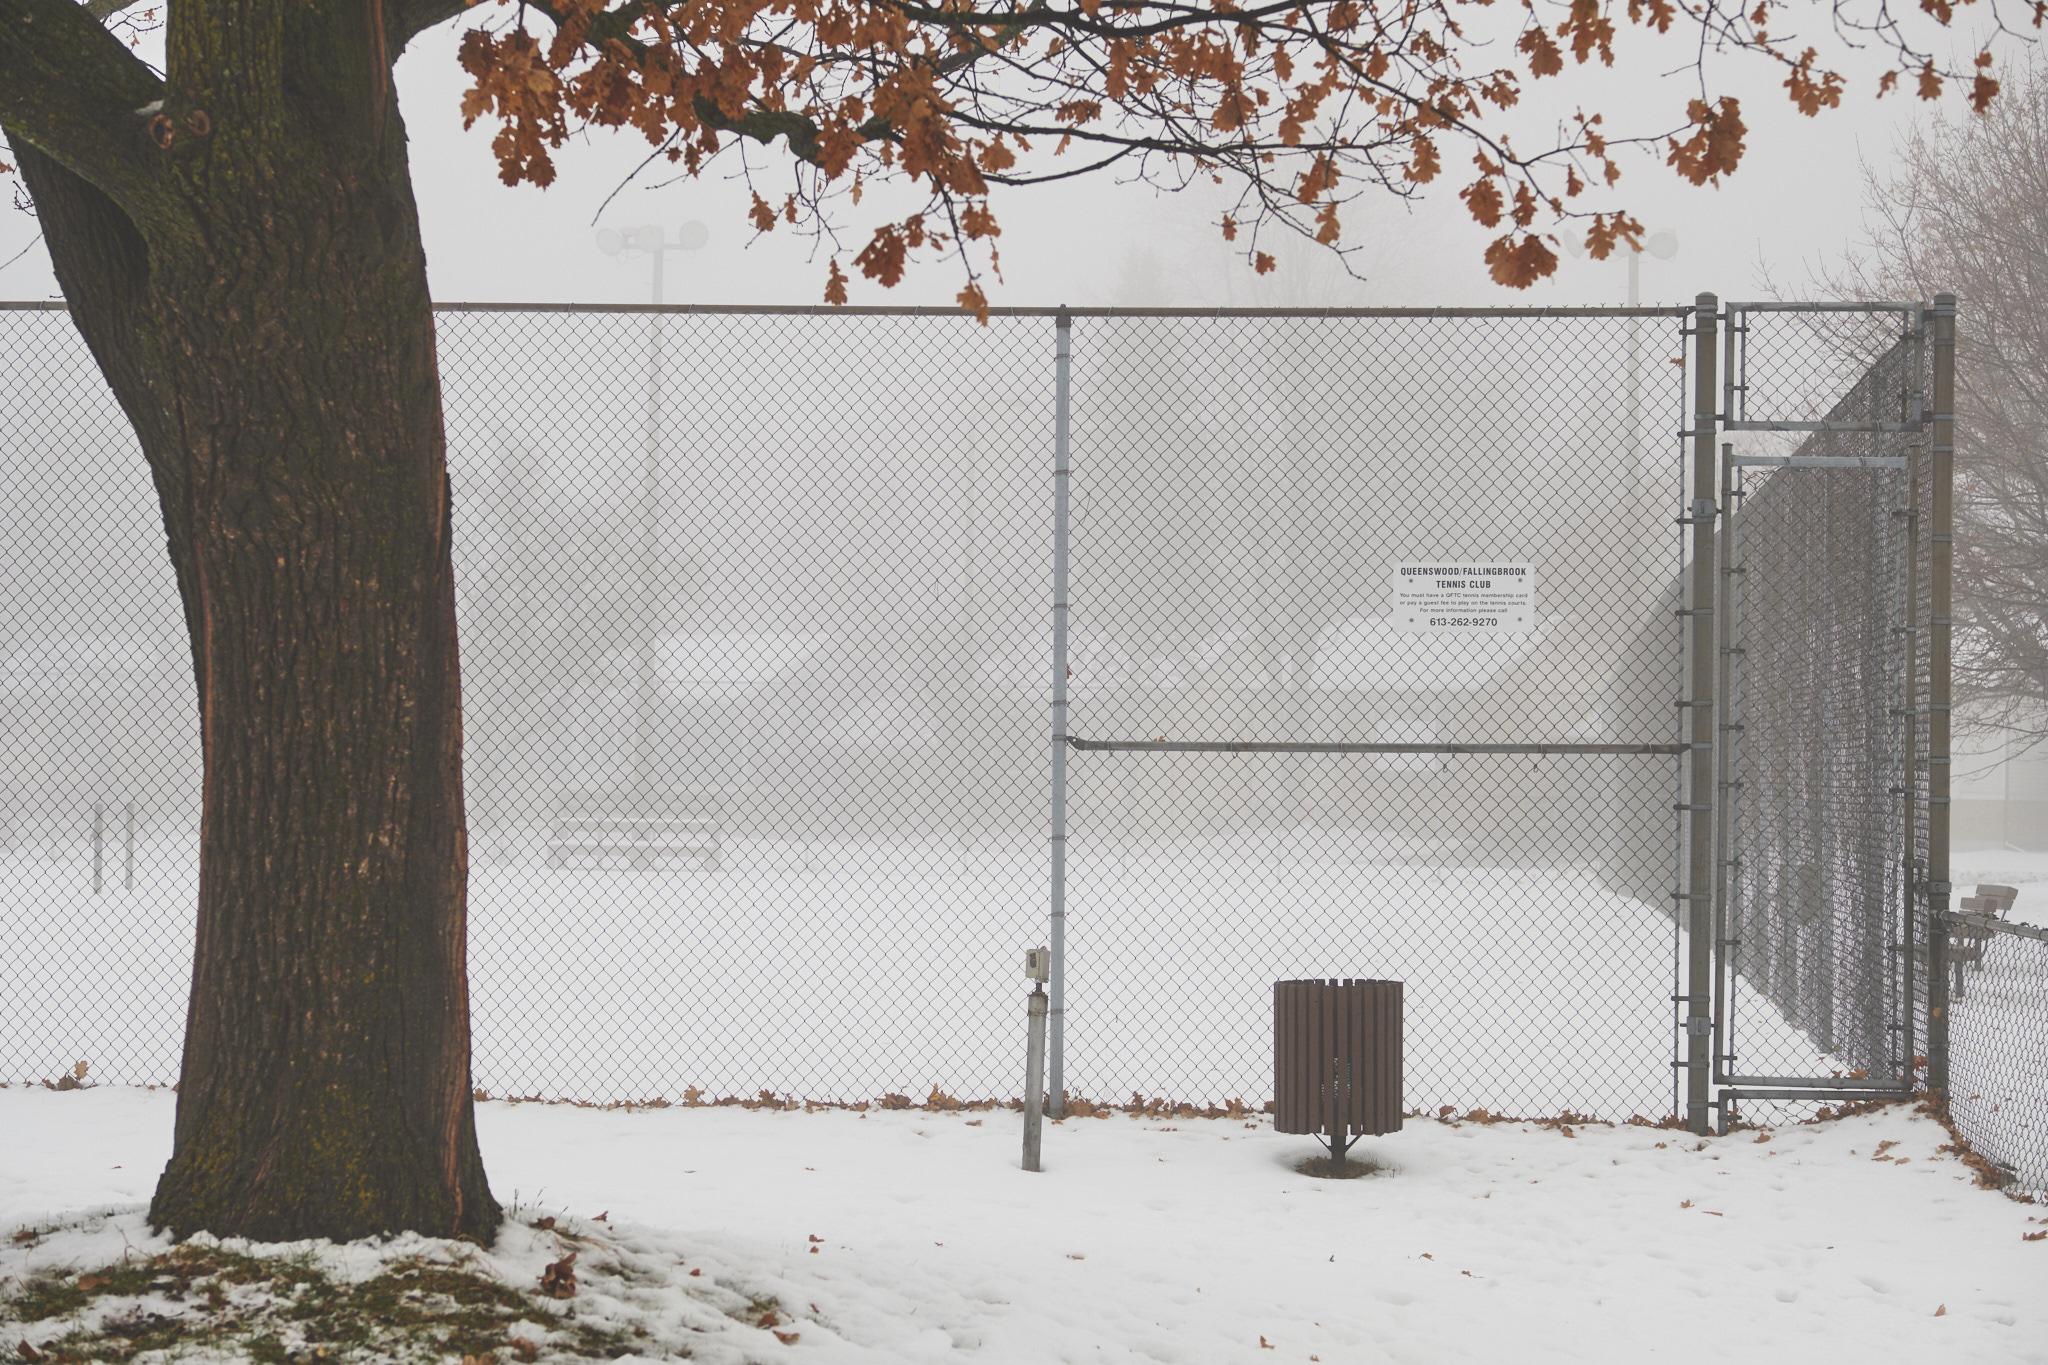 01-Foggy Ottawa-DSCF1040.jpg